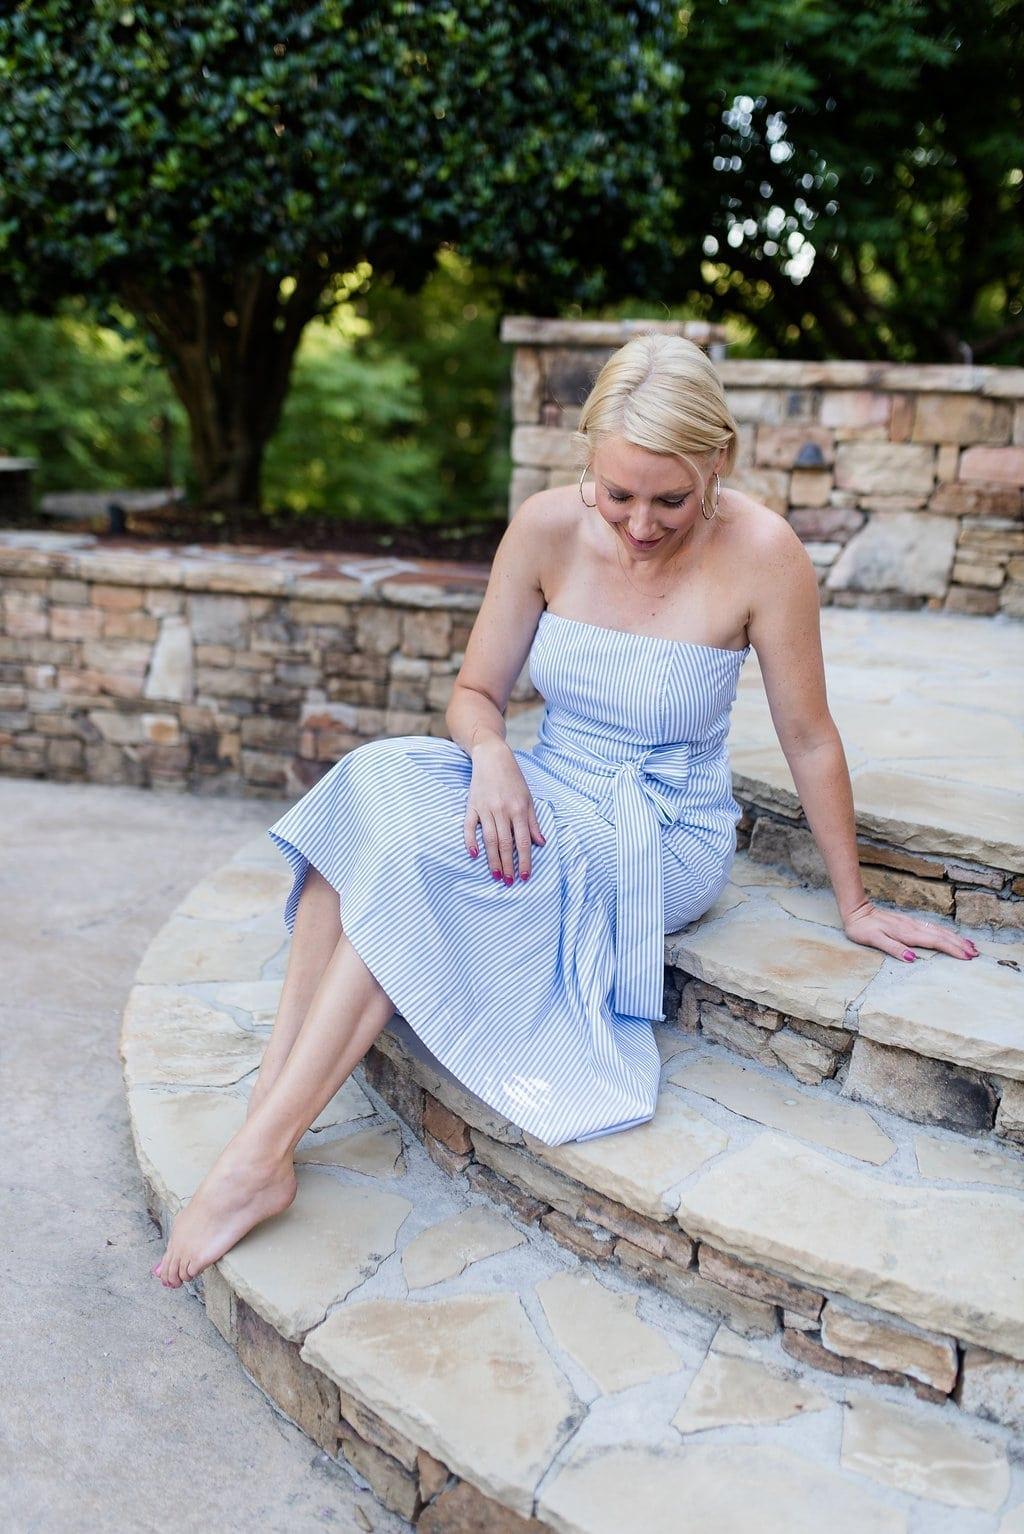 Strapless stripe dress. Pretty summer wedding outfit.